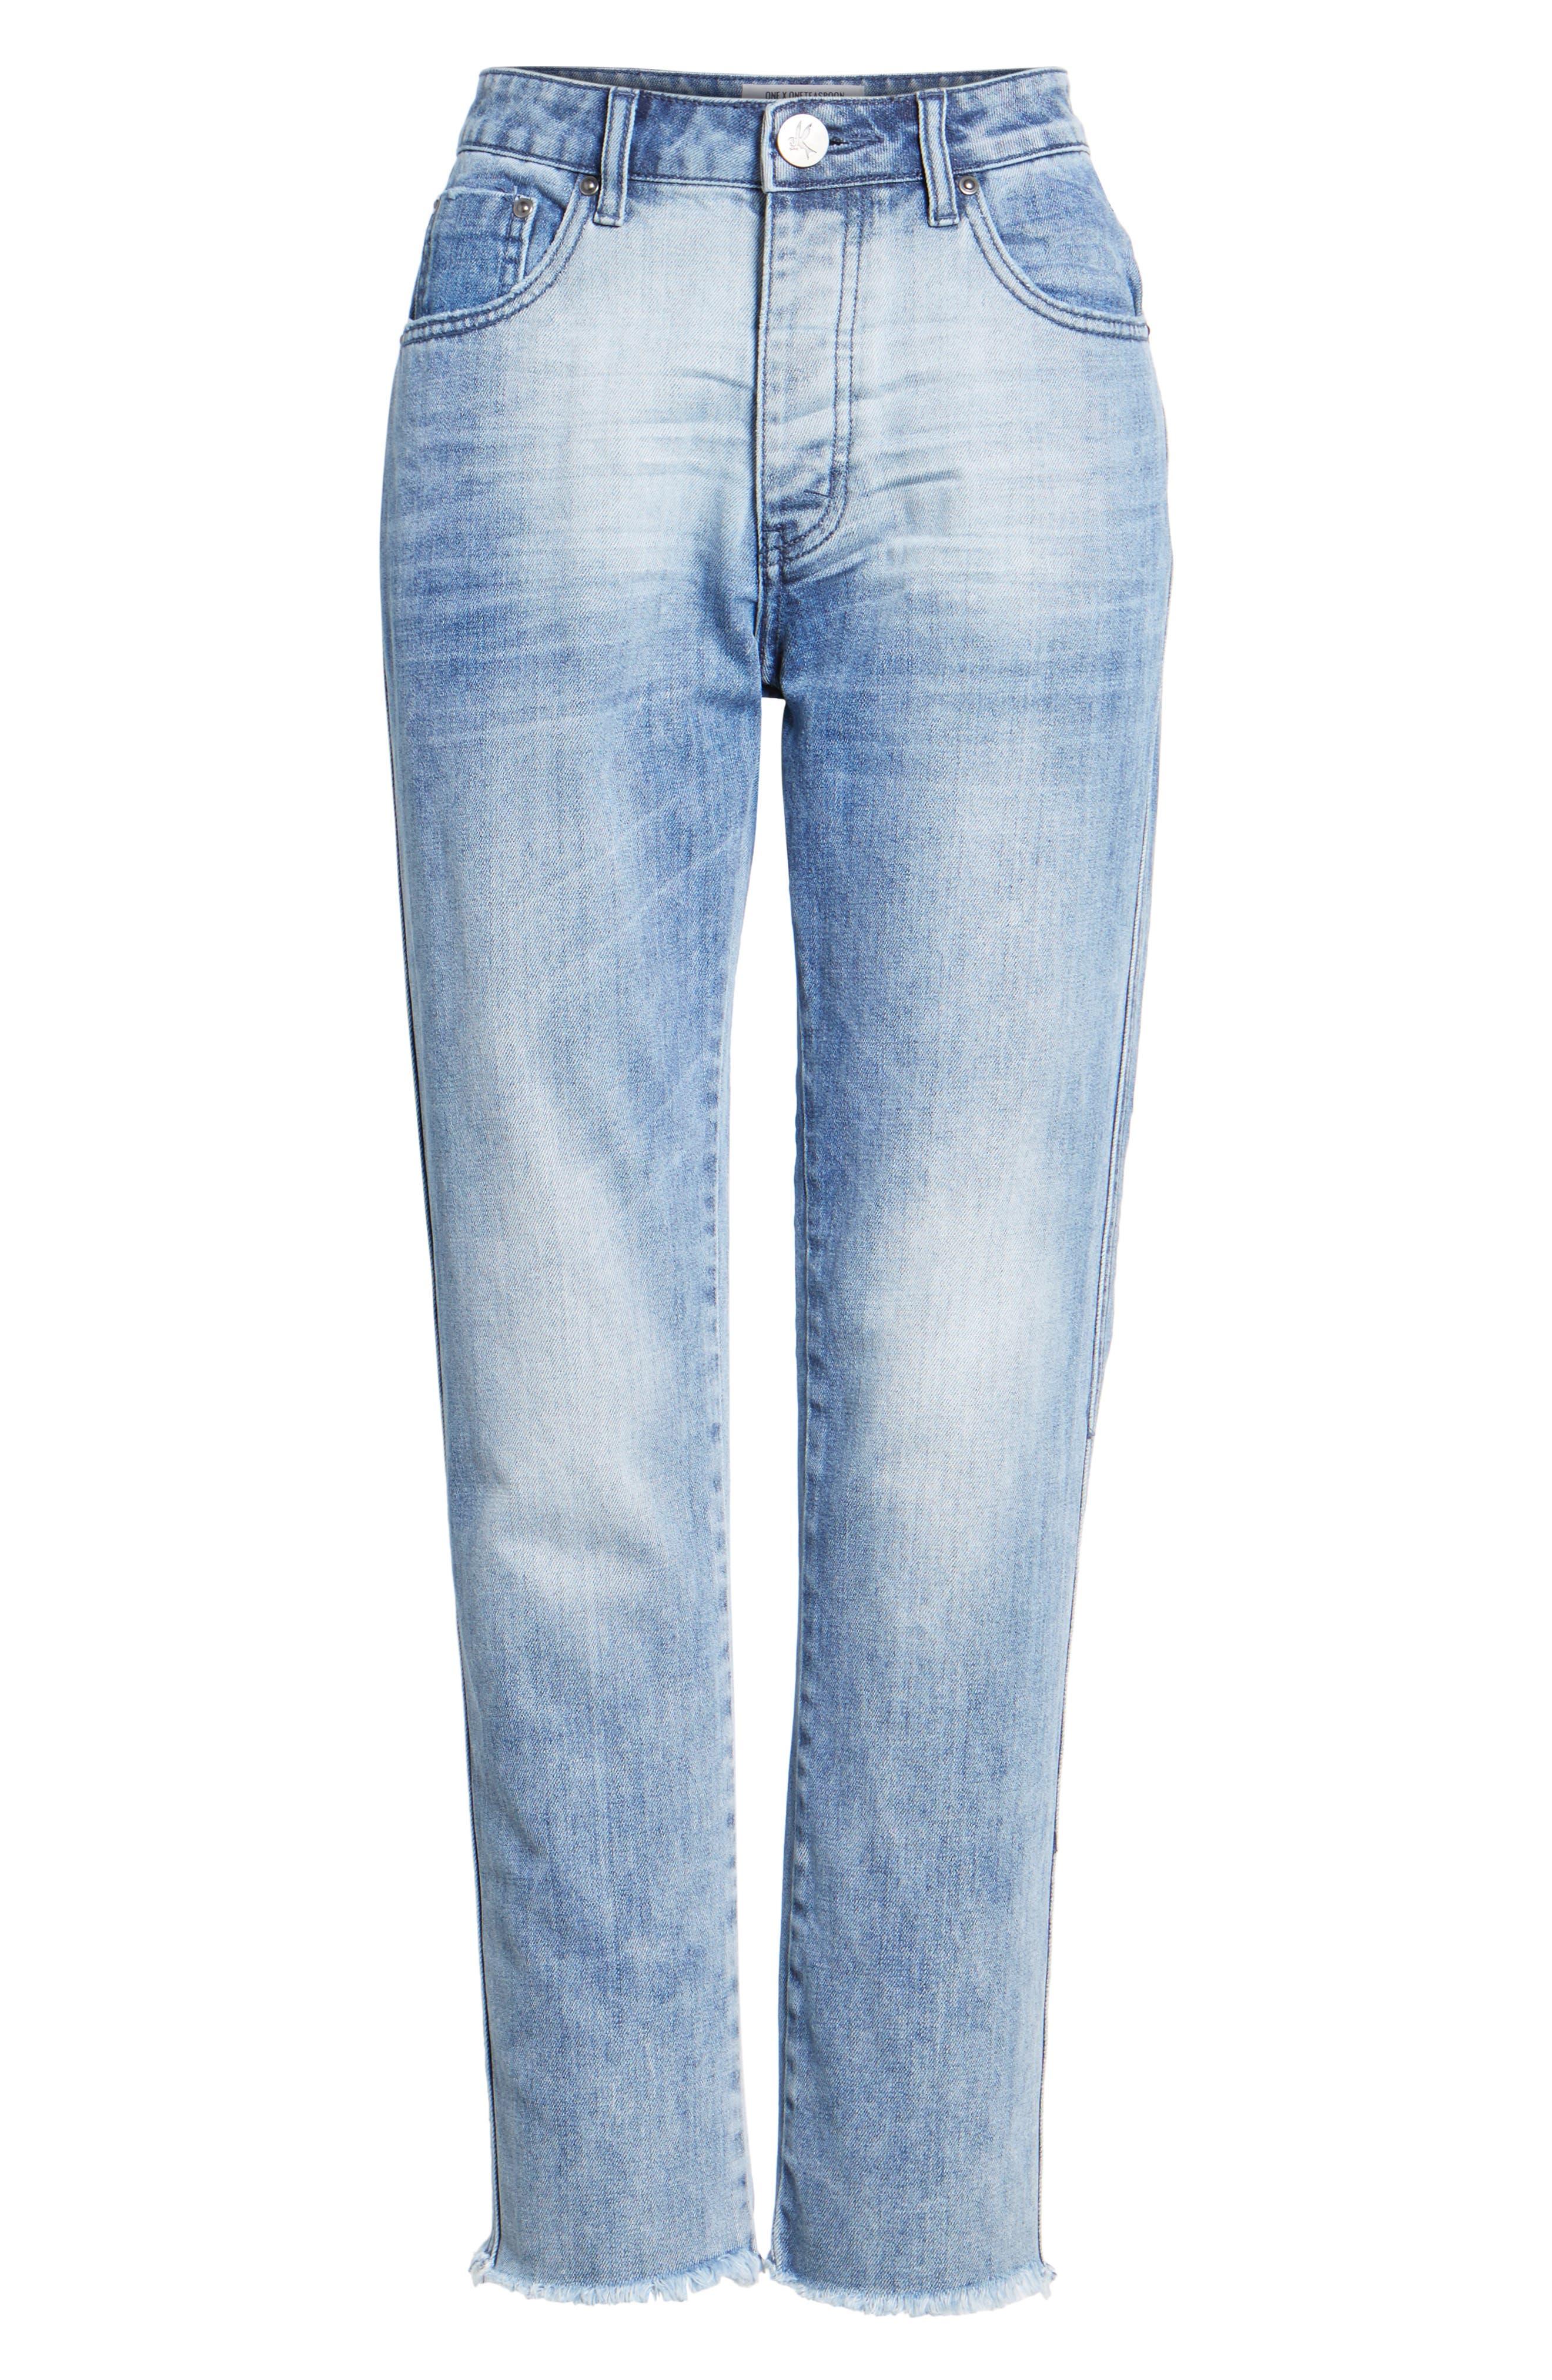 Tuckers High Waist Straight Leg Jeans,                             Alternate thumbnail 6, color,                             456